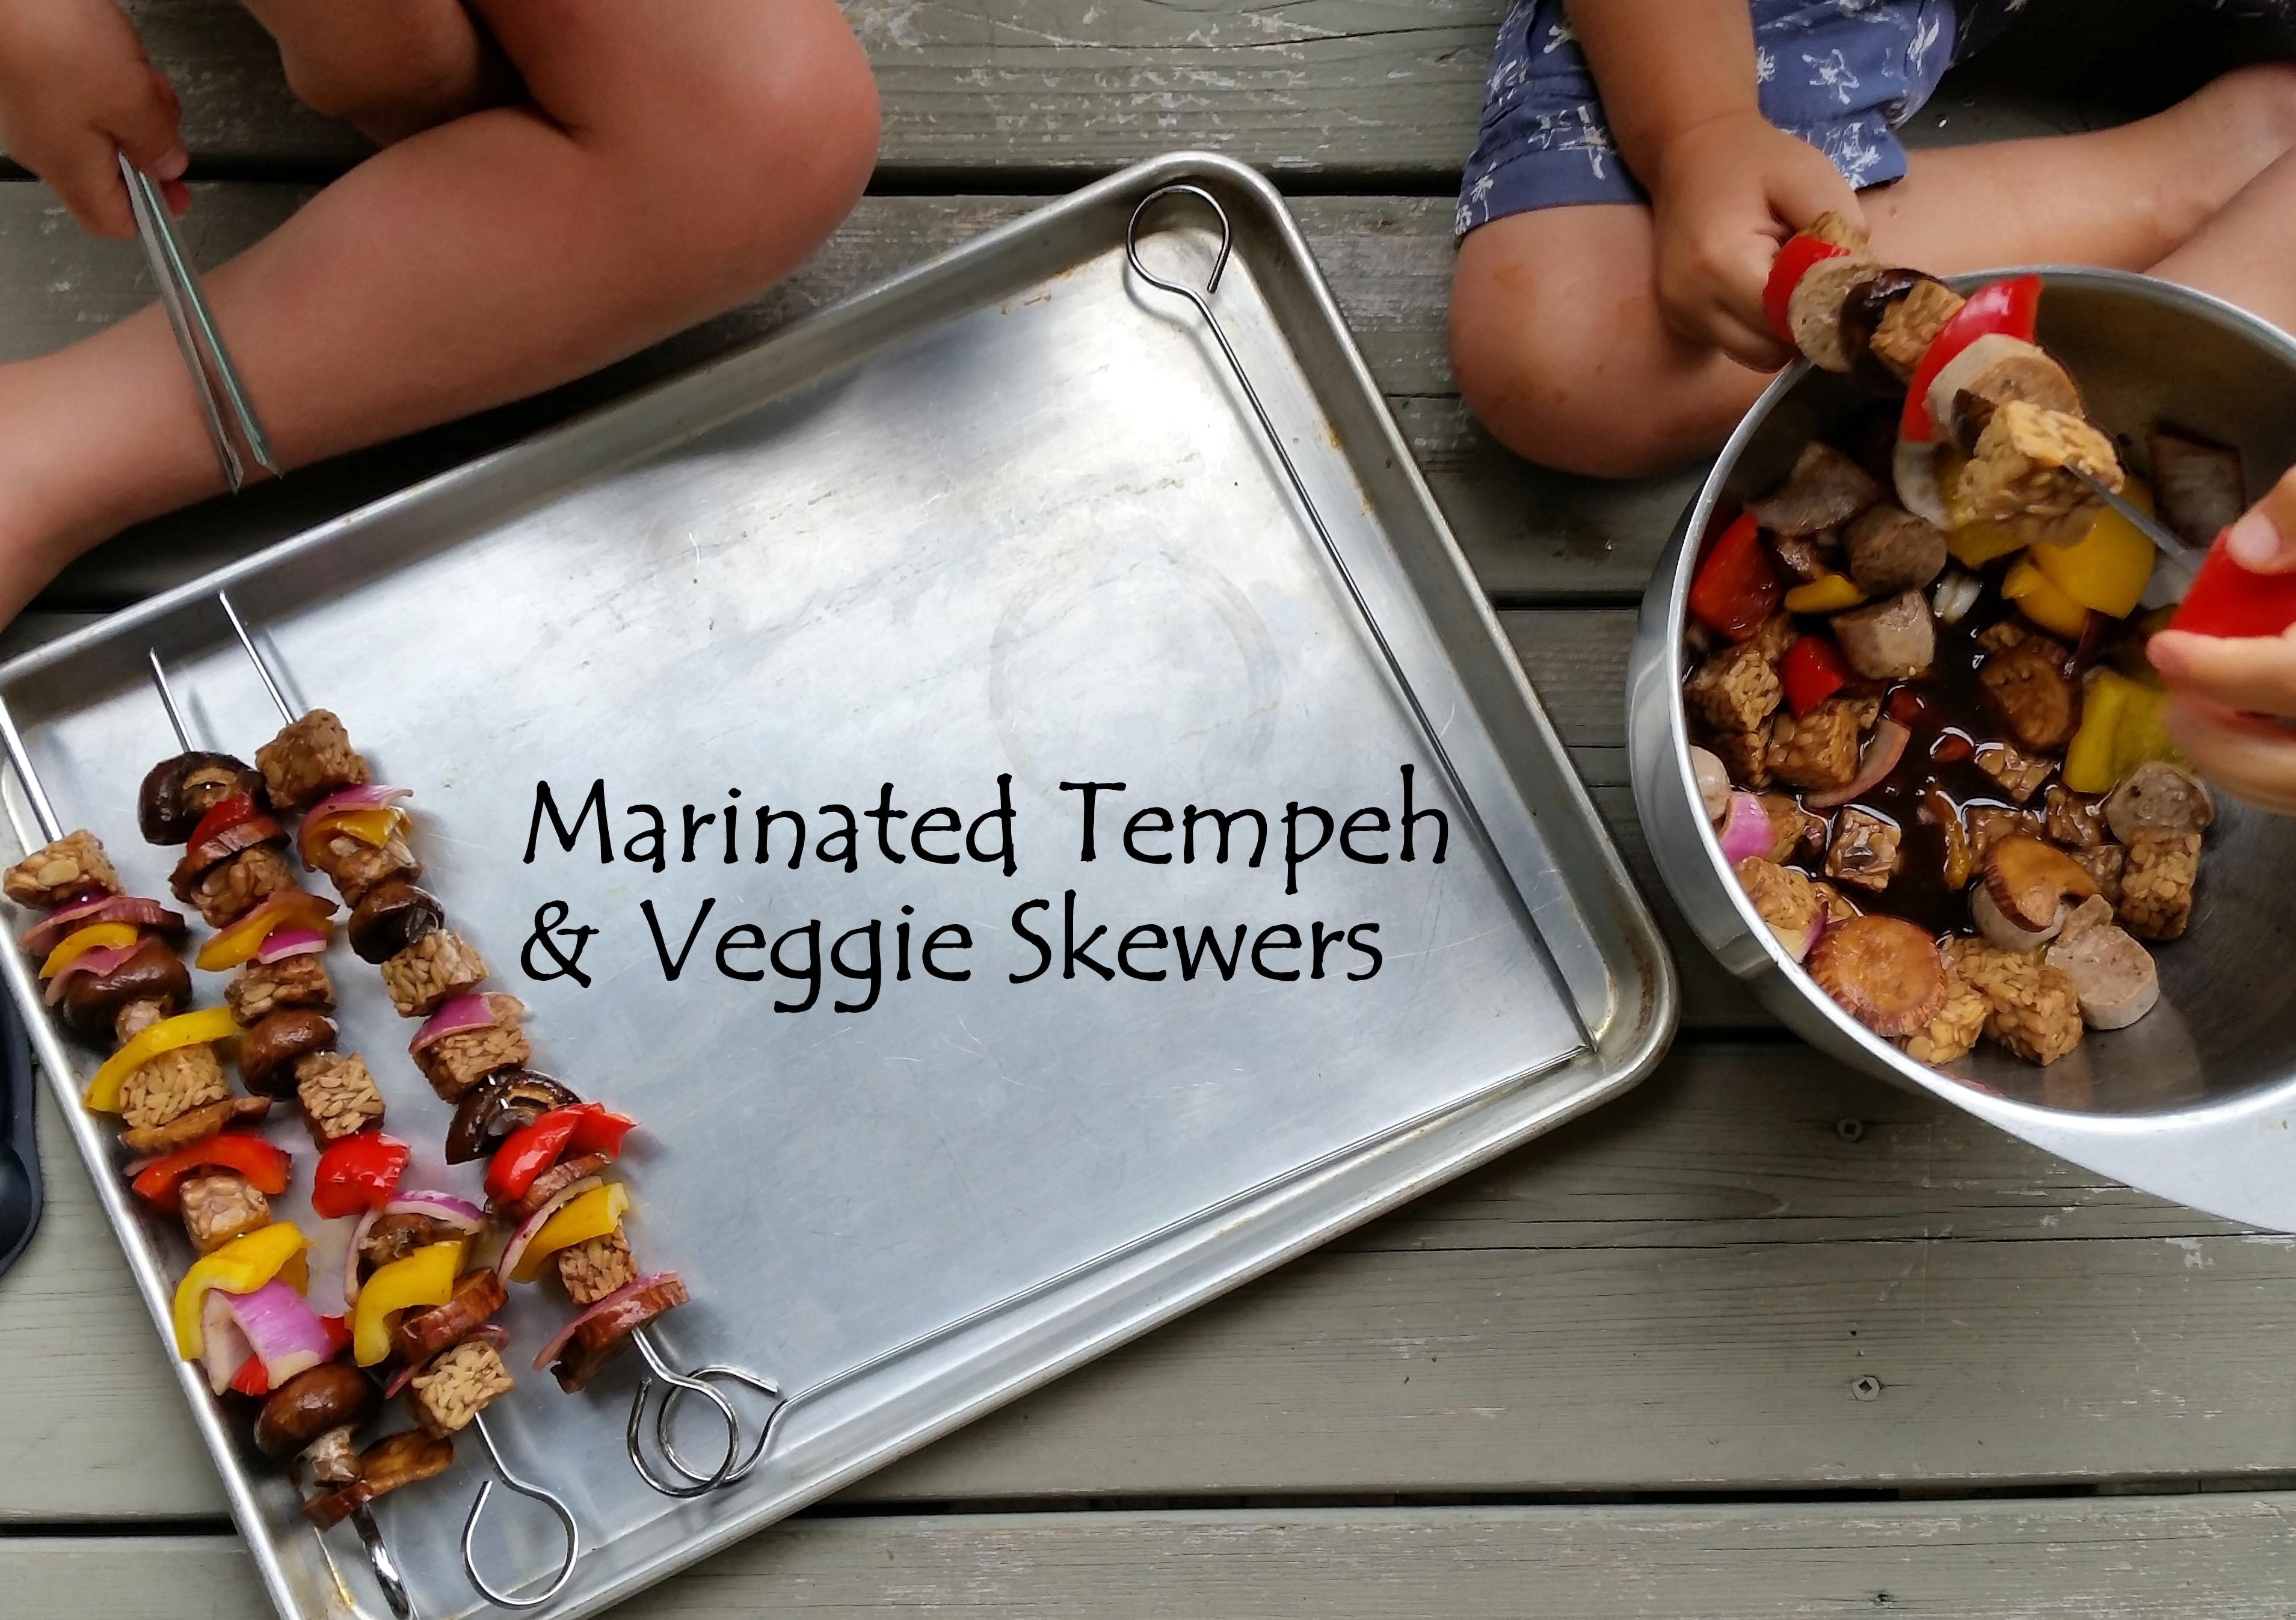 tempeh BBQ marinade healthy eating kids recipe vegetables vegan vegetarian loven life gluten free recipe ottawa